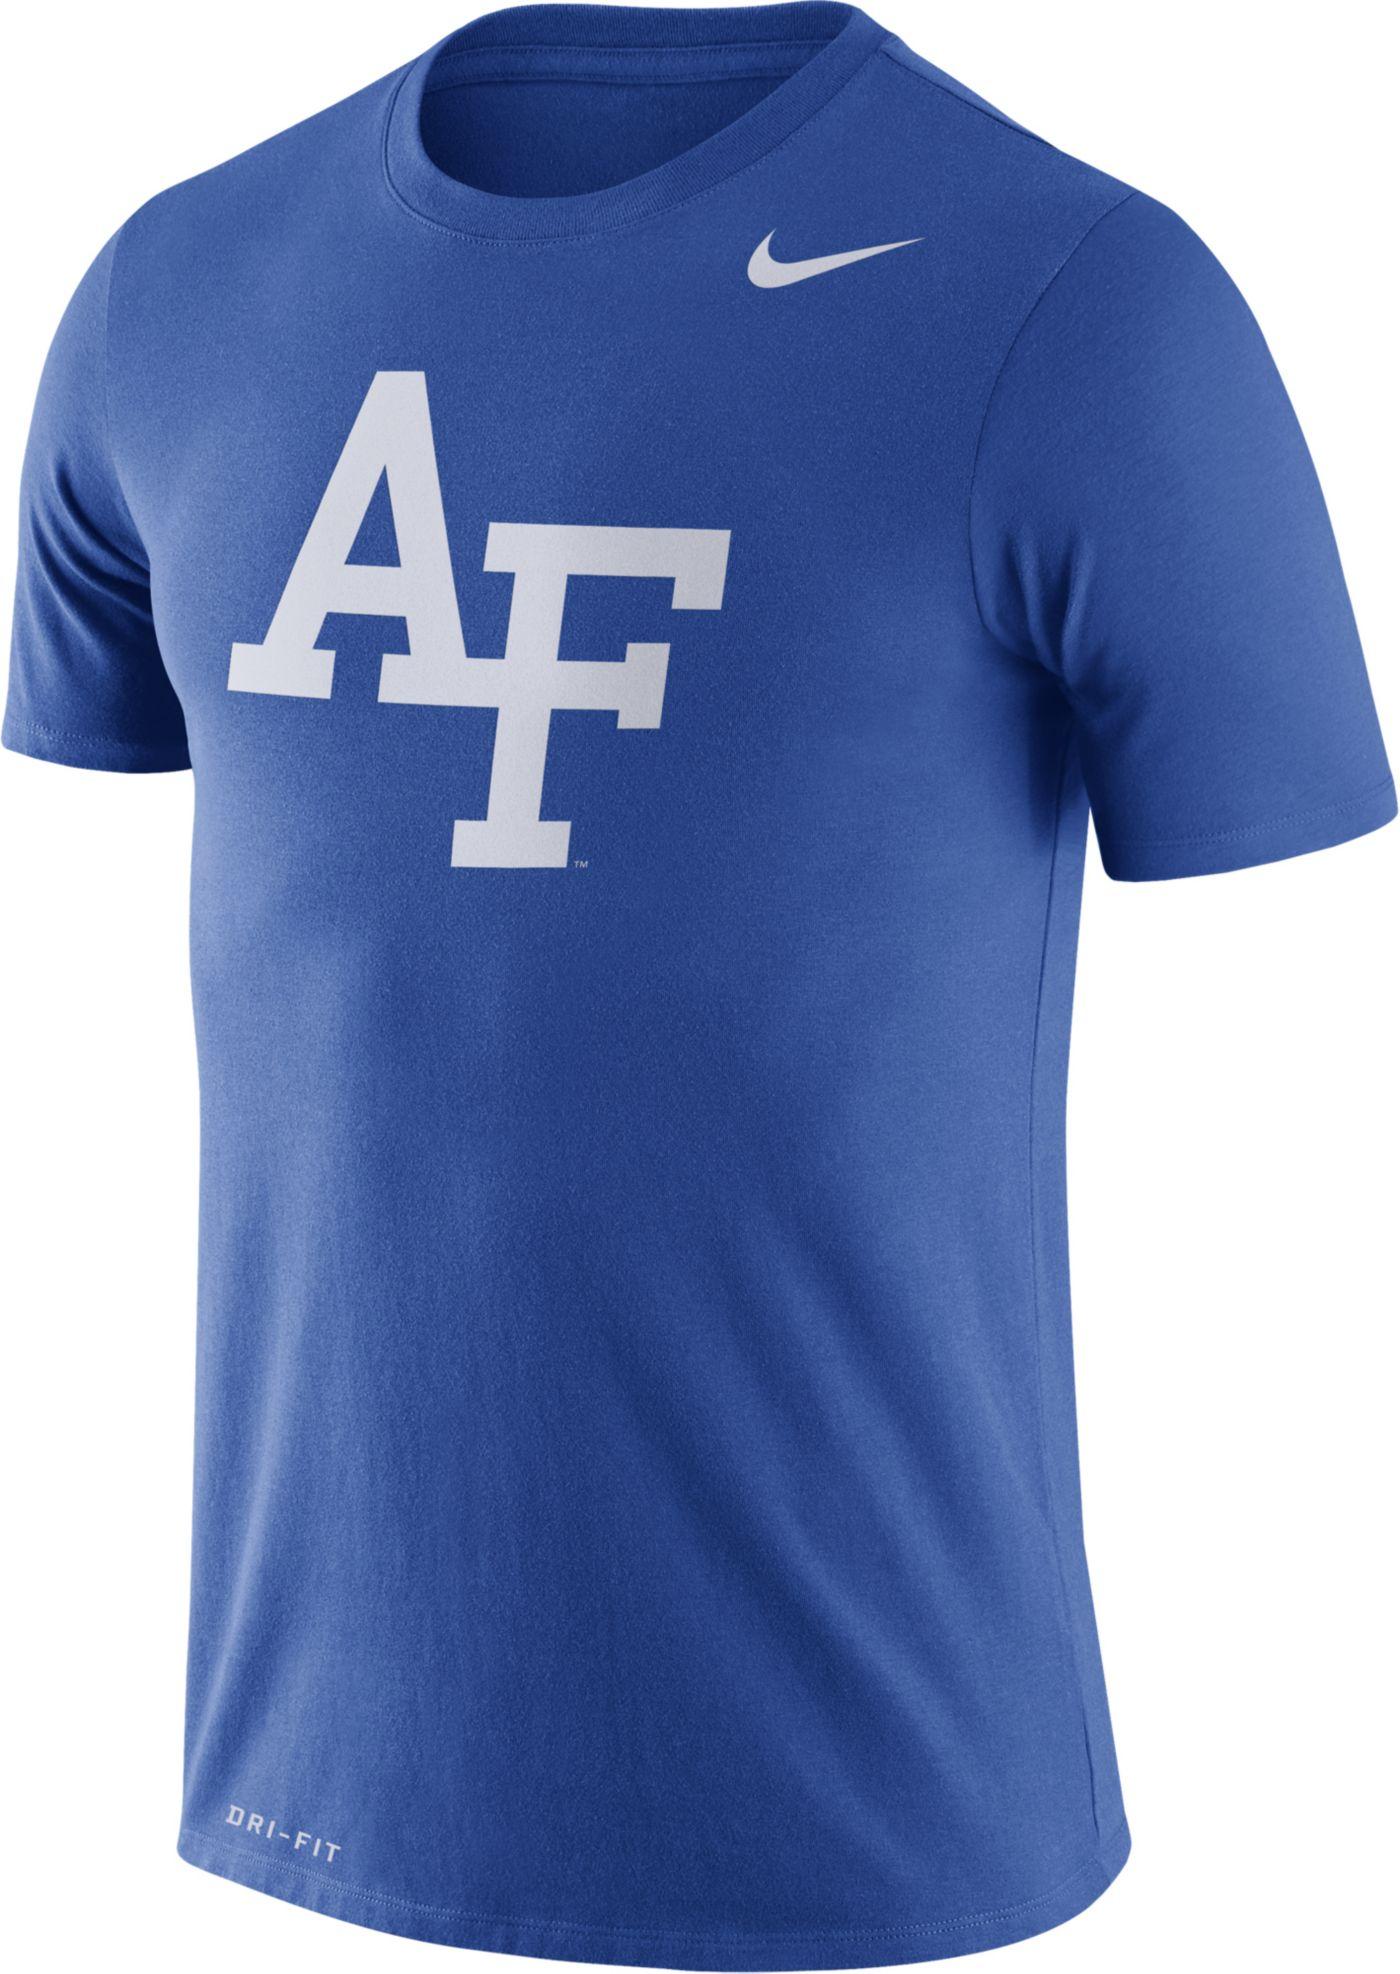 Nike Men's Air Force Falcons Blue Logo Dry Legend T-Shirt